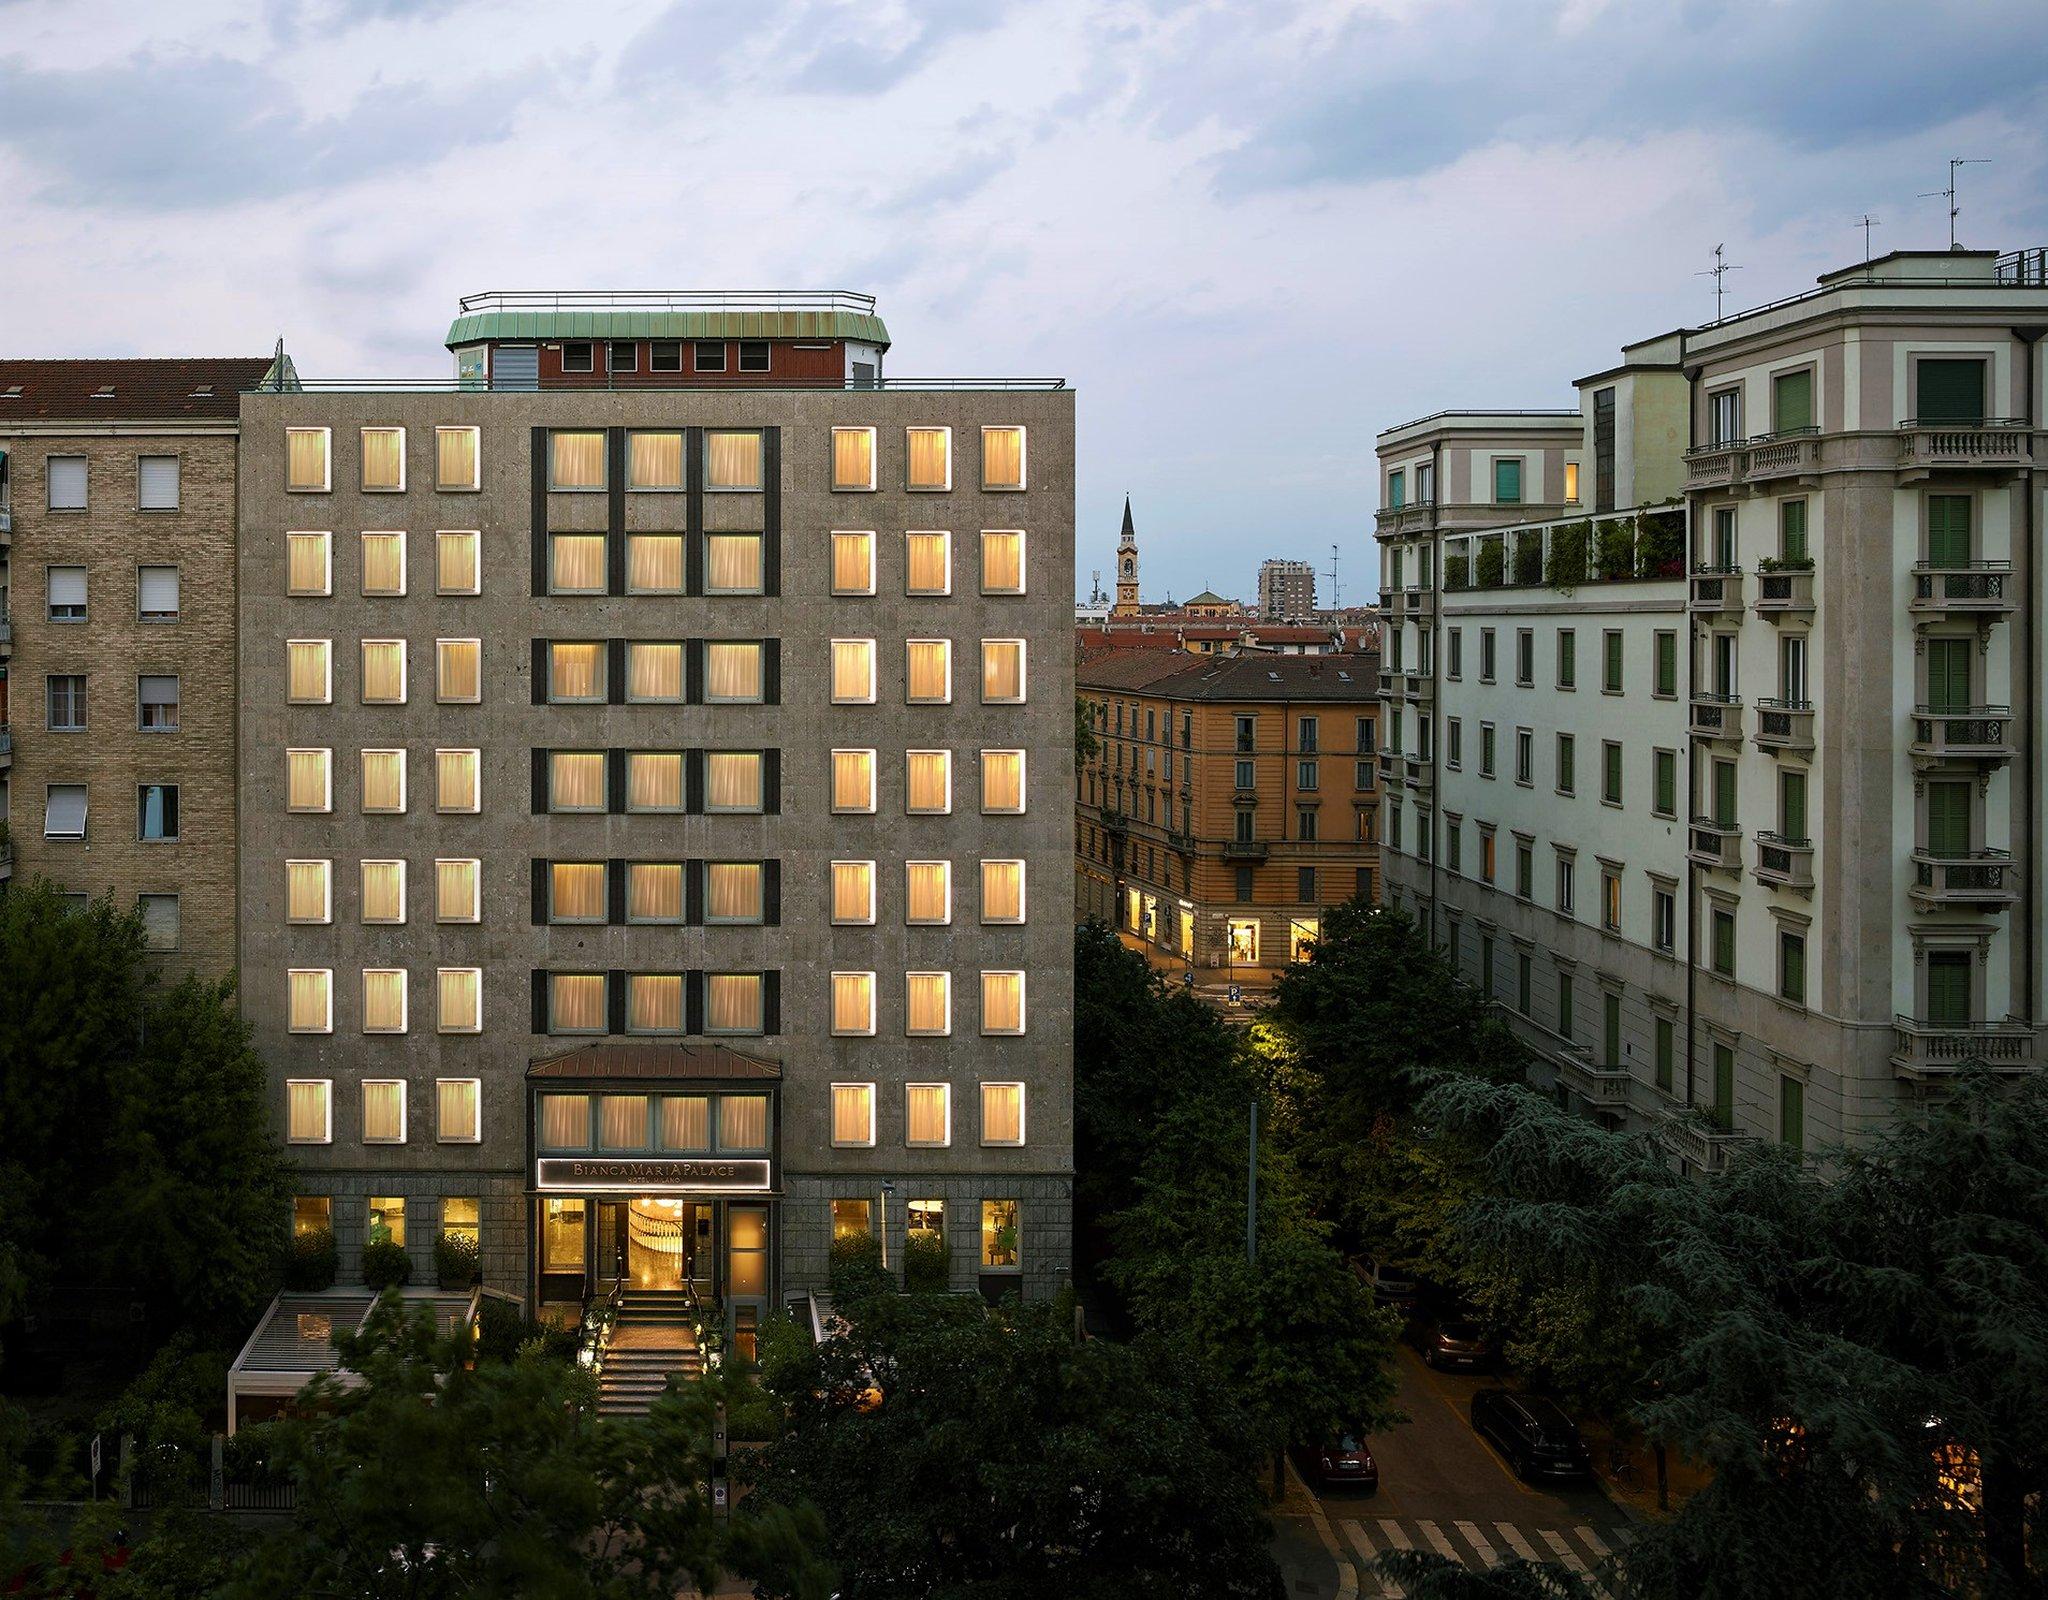 Bianca Maria Palace Hotel Milano